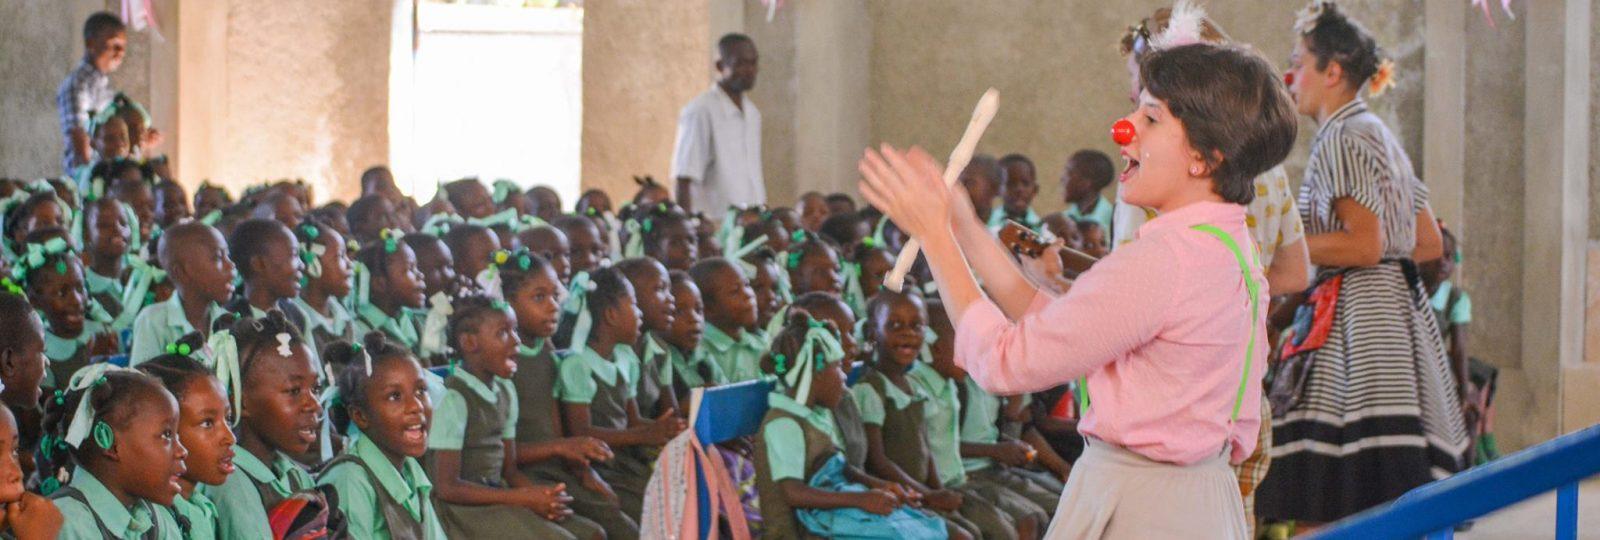 Kaitlin performs in Haiti.